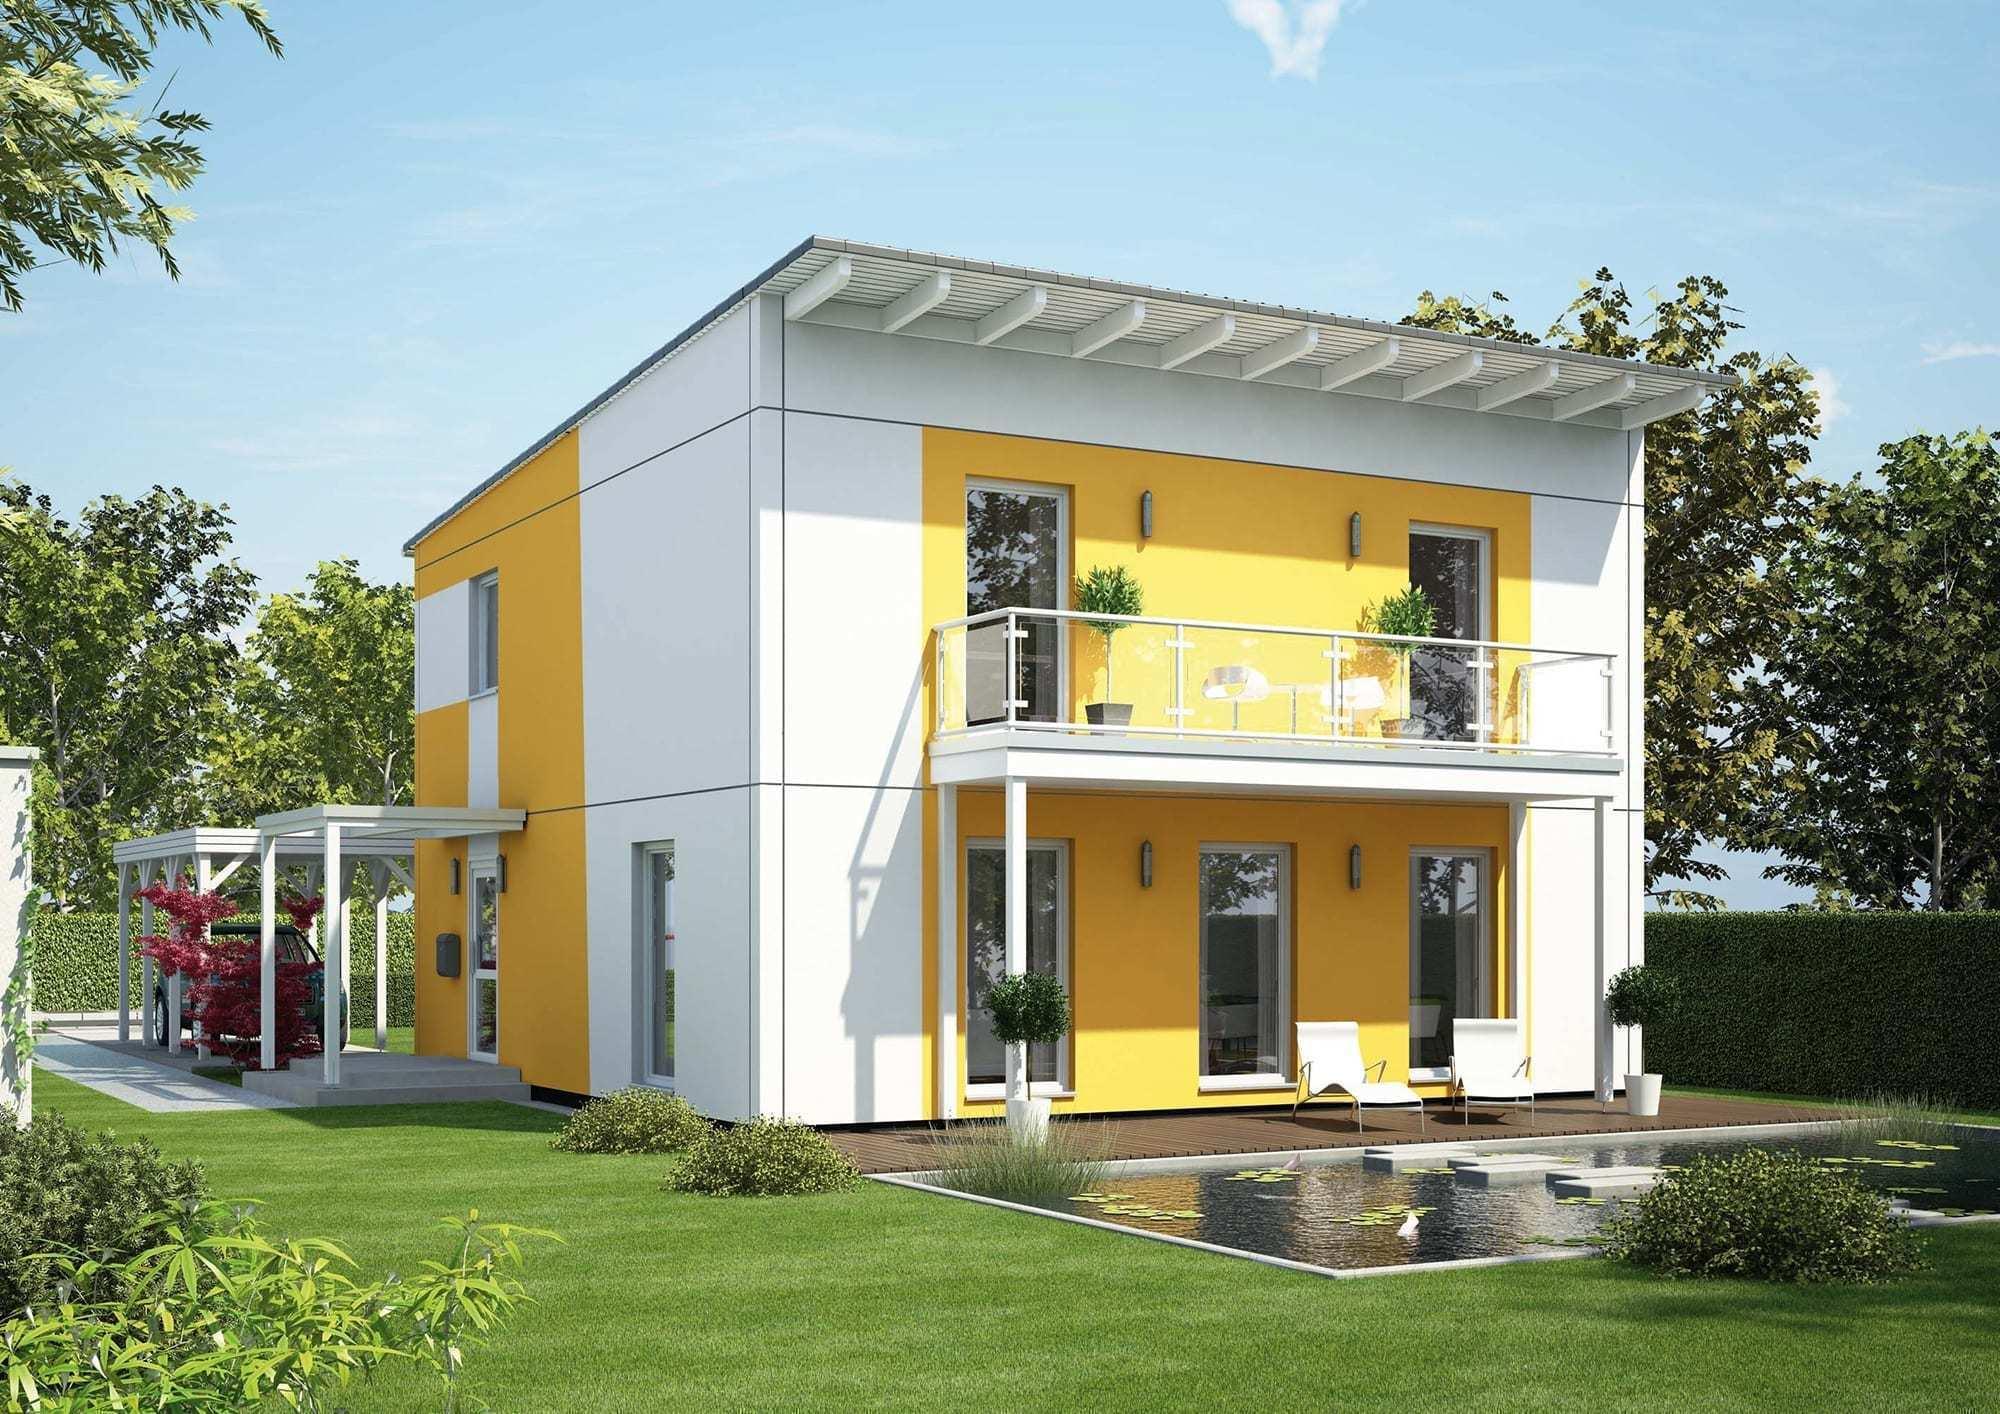 k mmerling 88plus passive house dr feist k mmerling. Black Bedroom Furniture Sets. Home Design Ideas